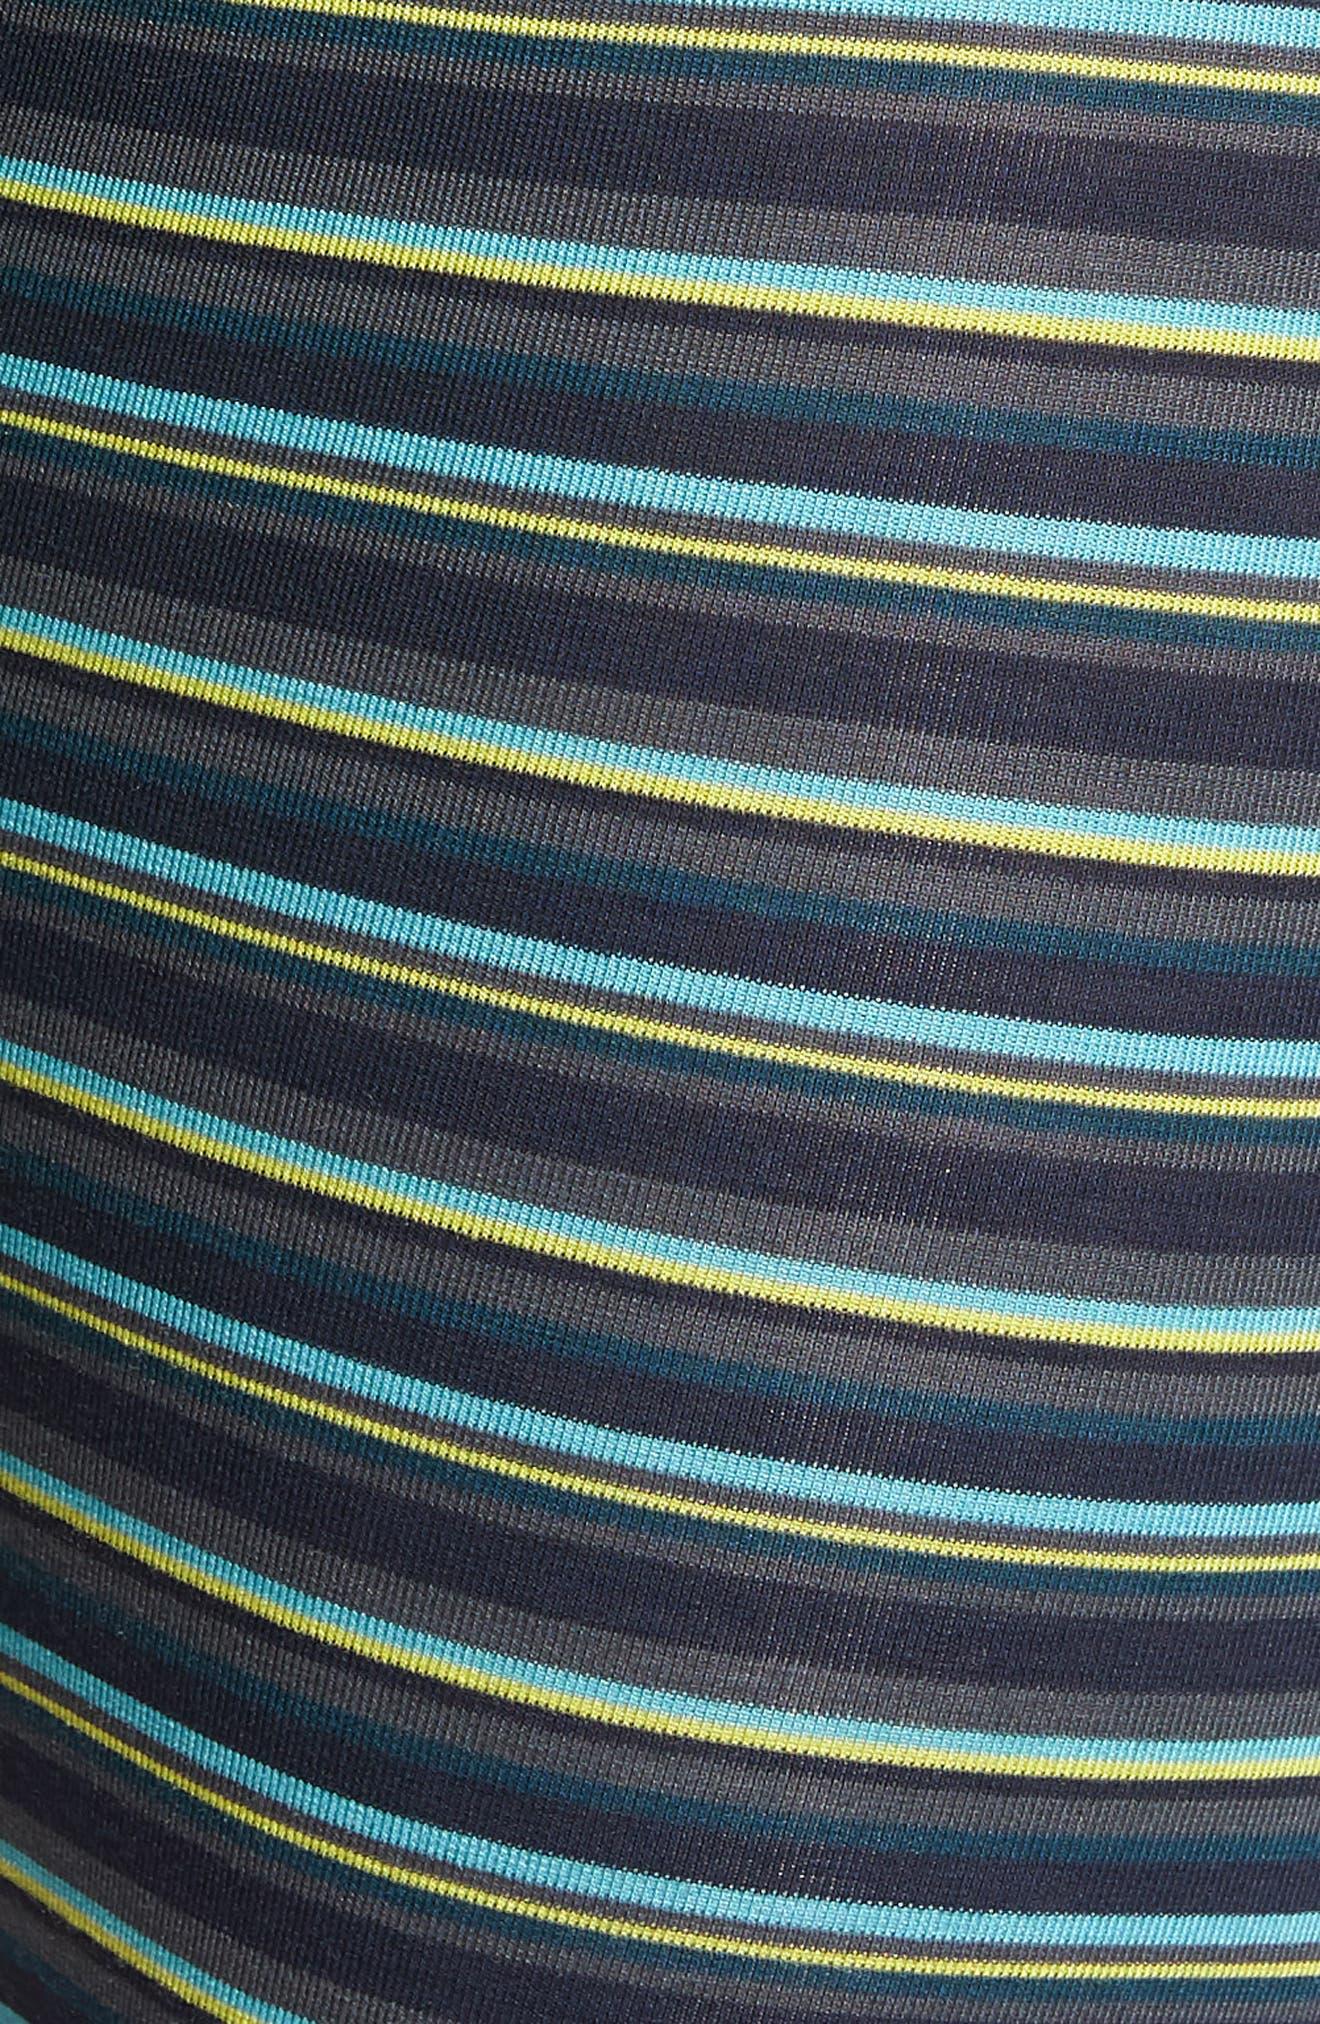 Second Skin Boxer Briefs,                             Alternate thumbnail 5, color,                             DRESS BLUES/ TURBULENCE